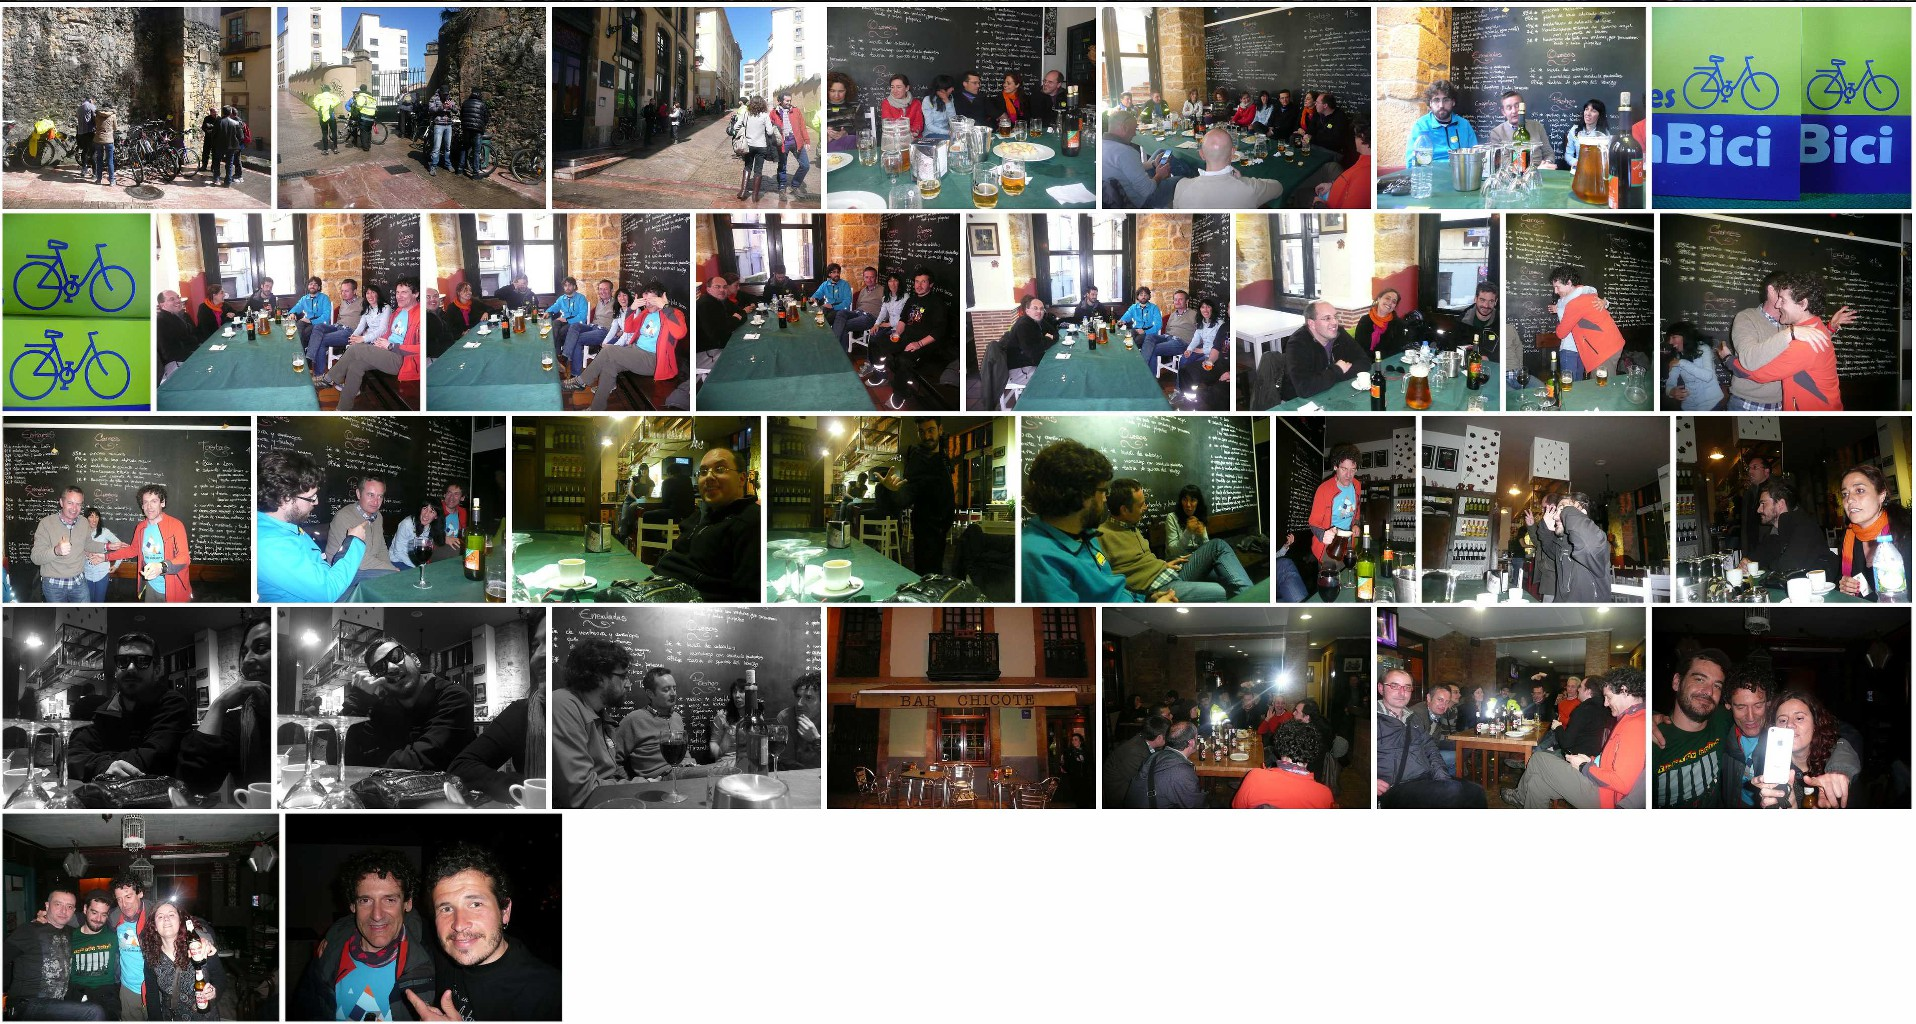 AcB-Bicitapeo23.03.2014-unlbumdeFlickr.jpg